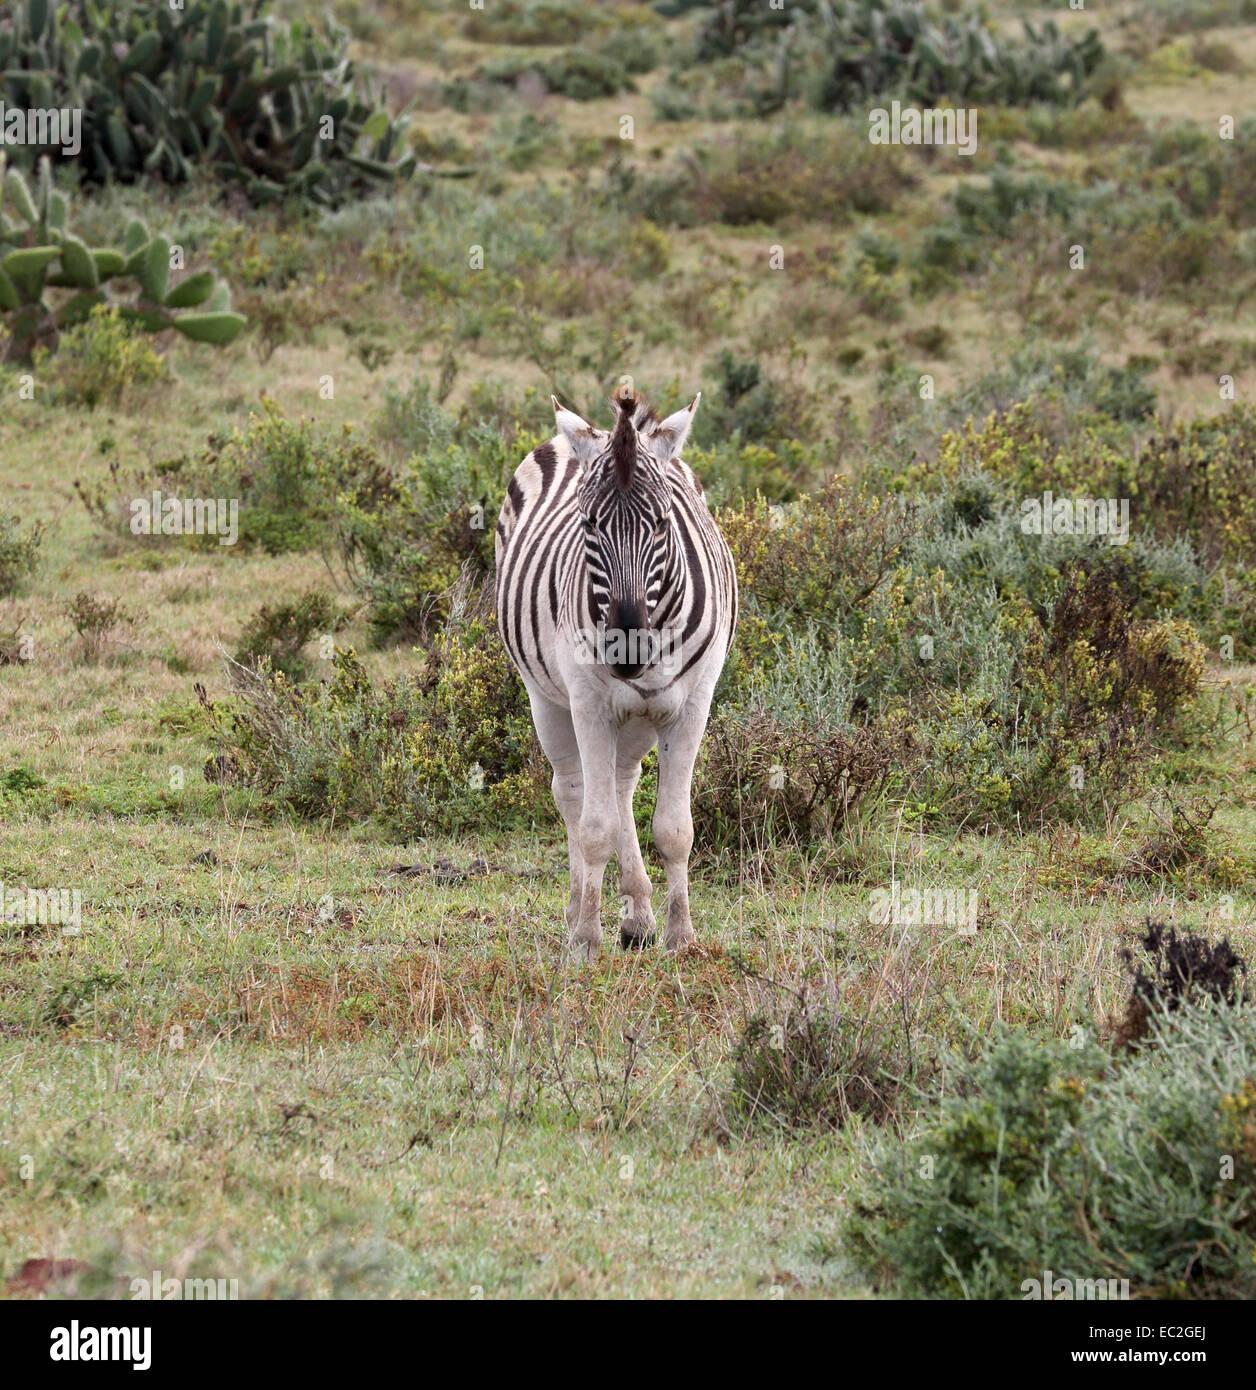 Wild Zebra auf das Kariega Wildreservat in Südafrika Stockbild